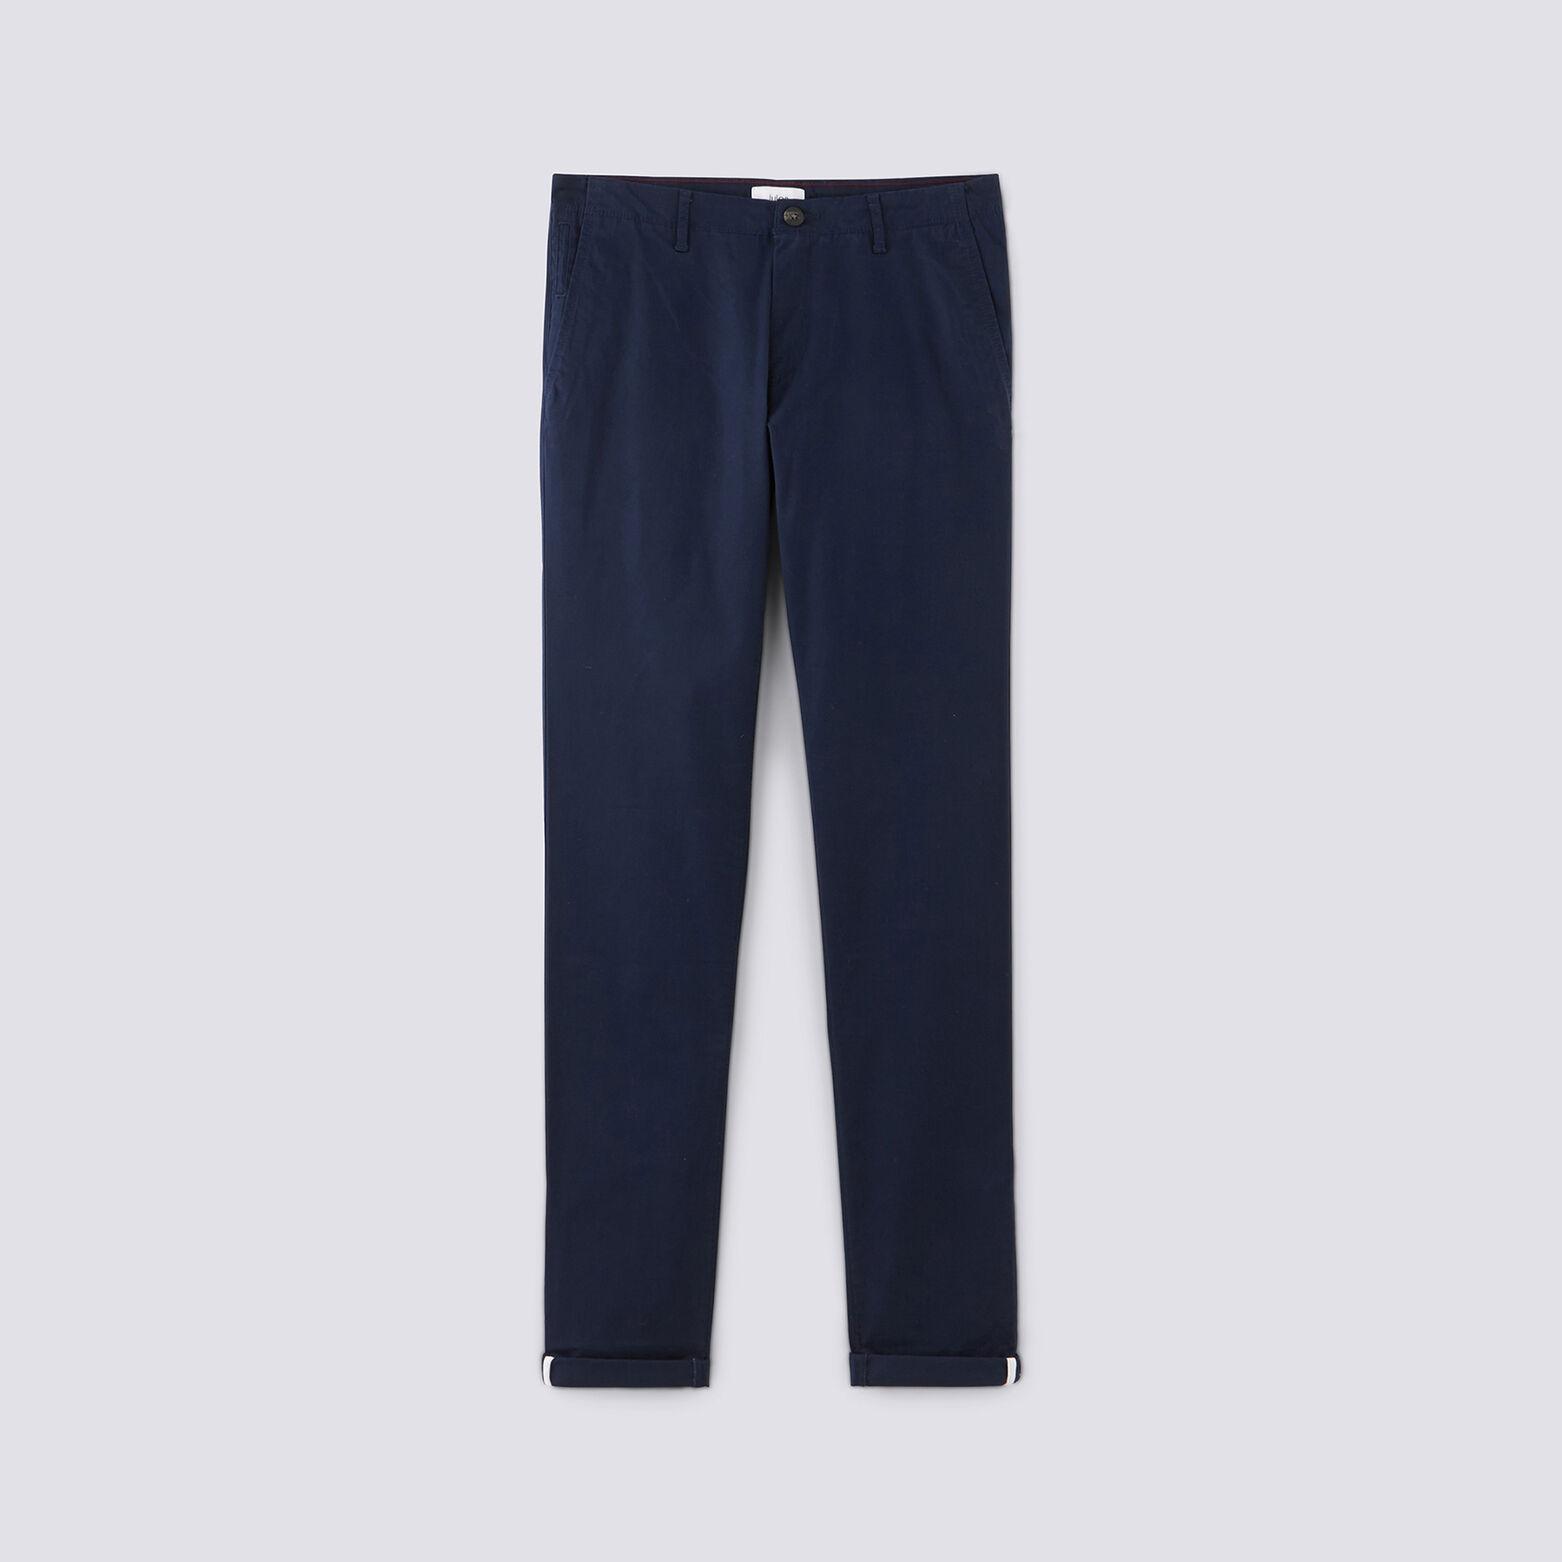 Pantalon chino slim sasha